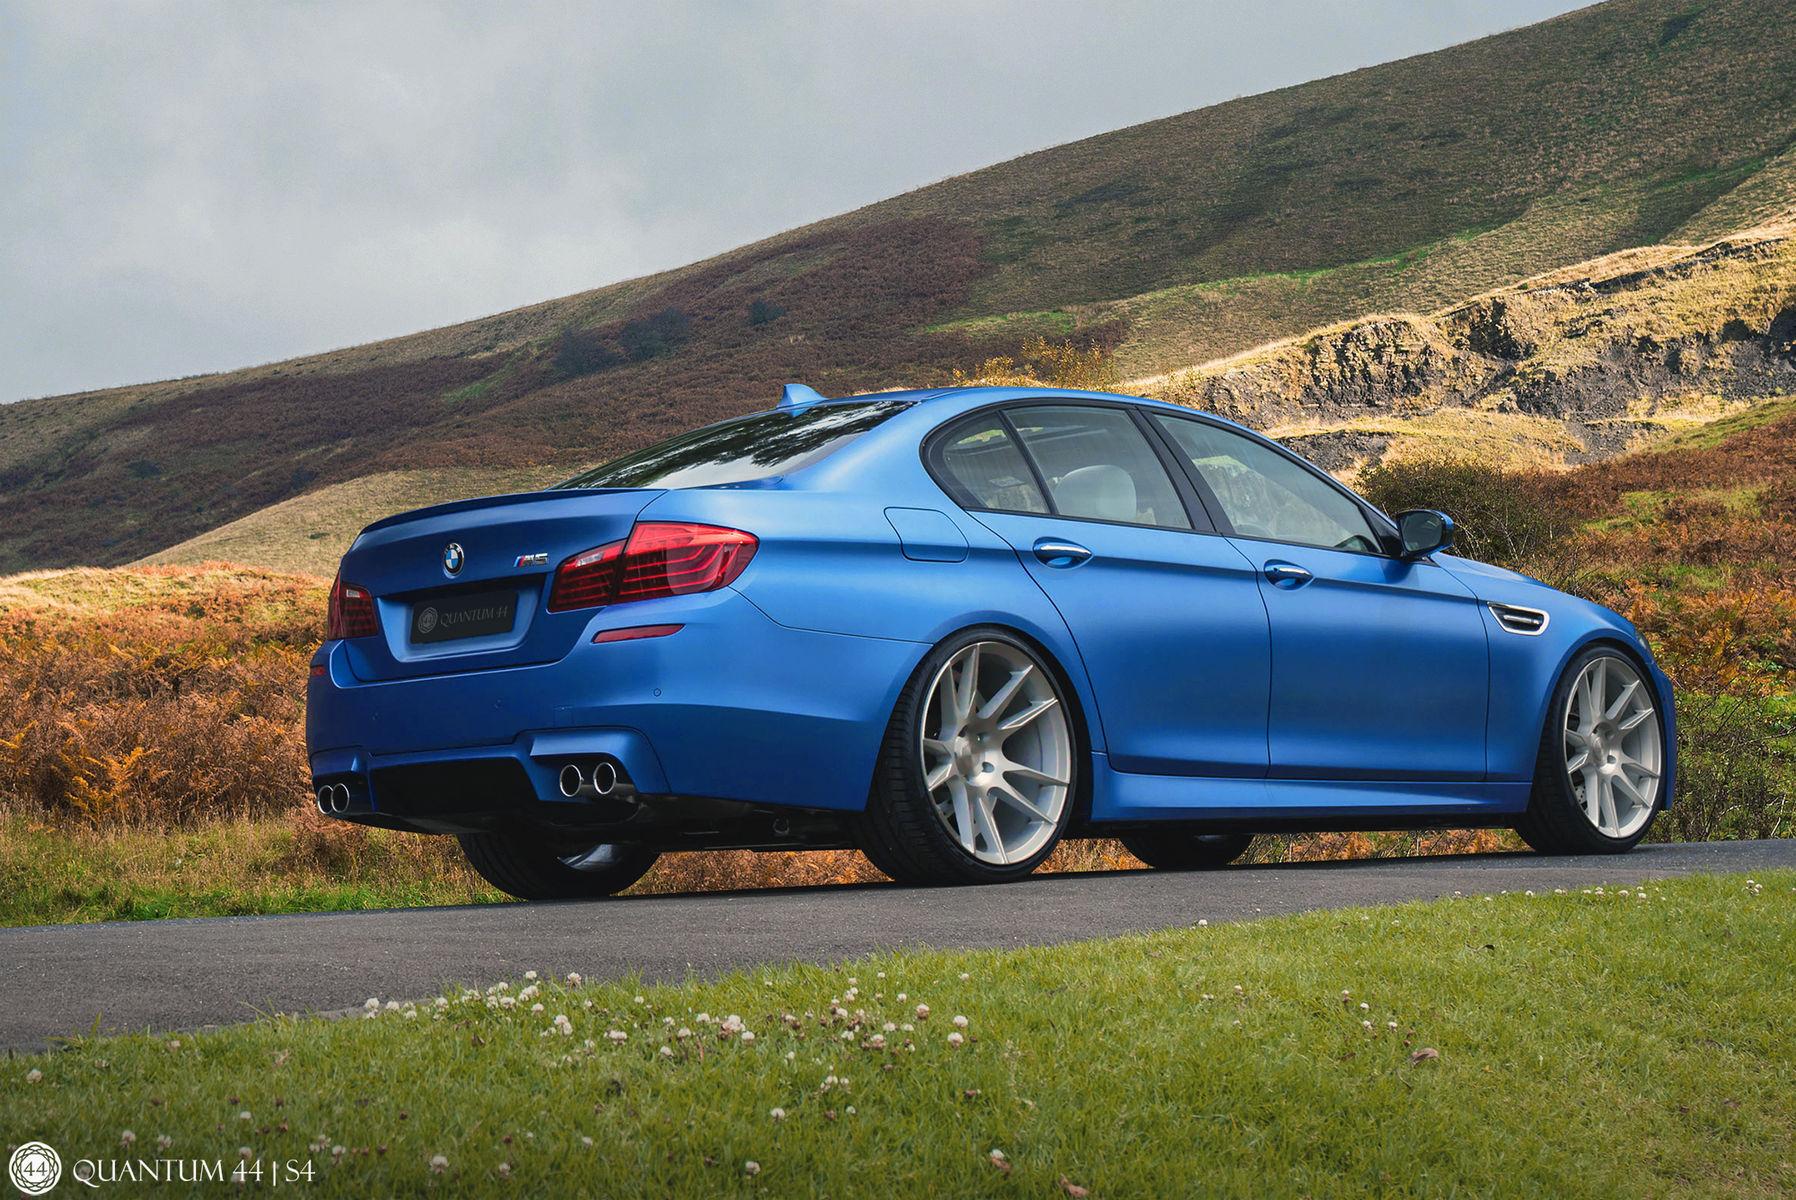 BMW M5 | Quantum44 S4 - BMW M5